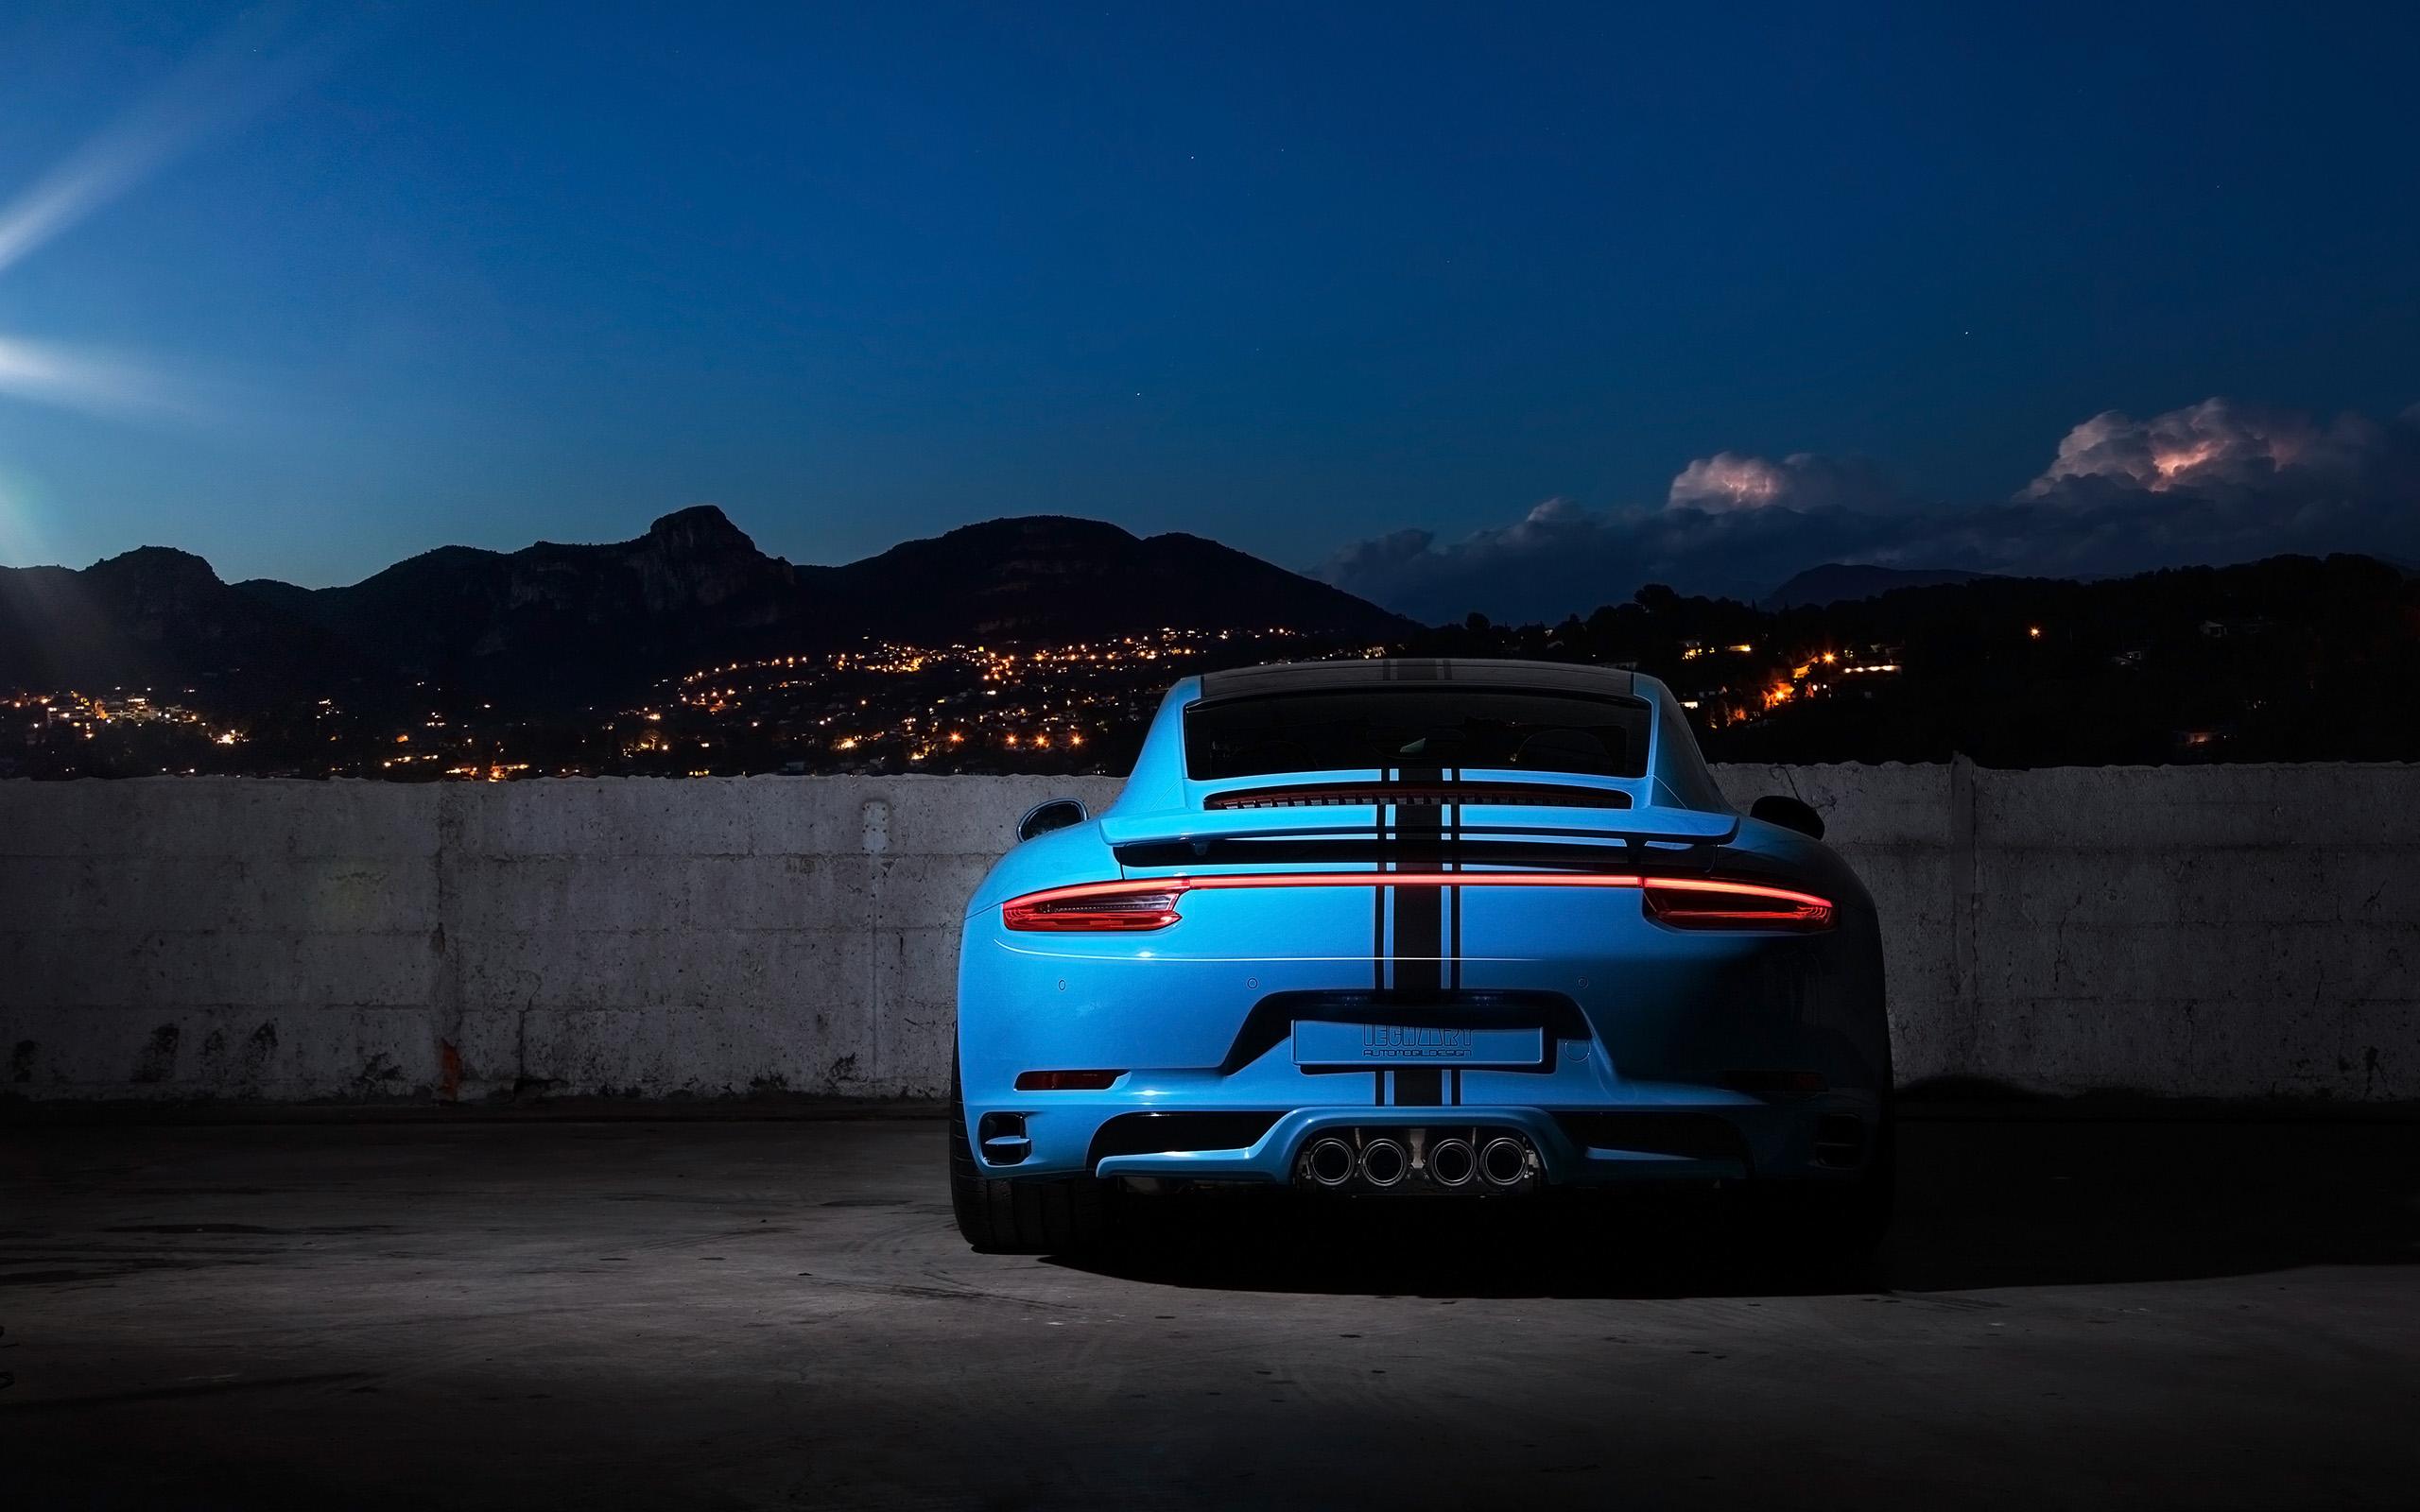 2016 Techart Porsche 911 Coupe 2 Wallpaper Hd Car